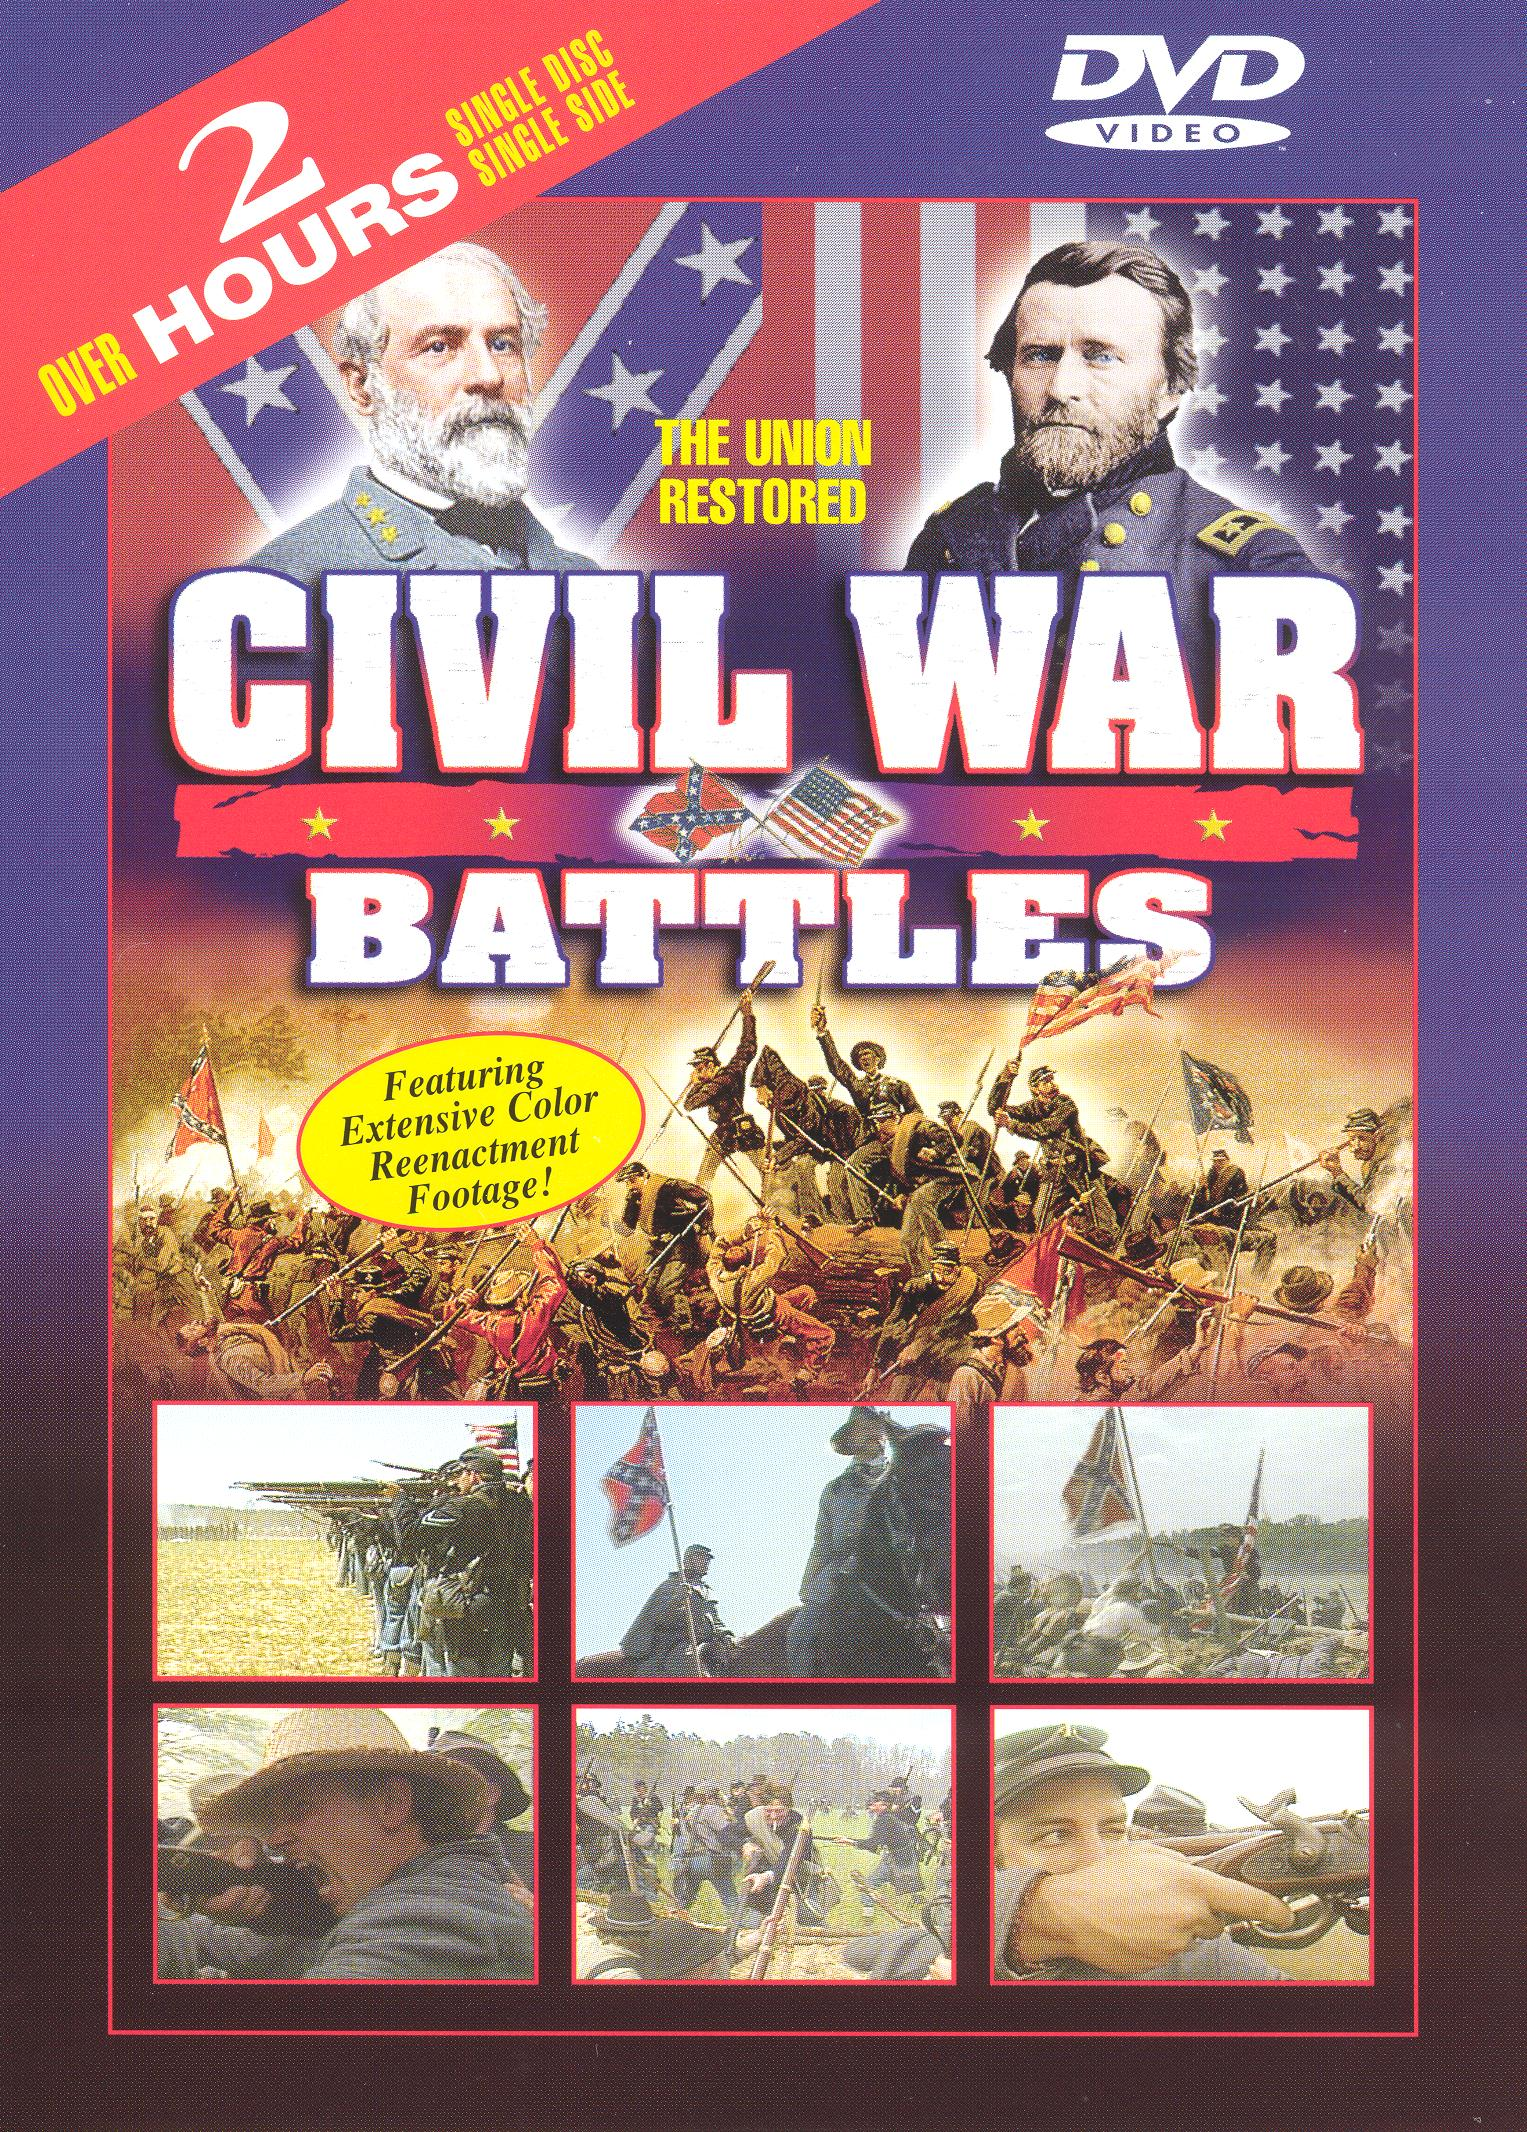 Civil War Battles: The Union Restored